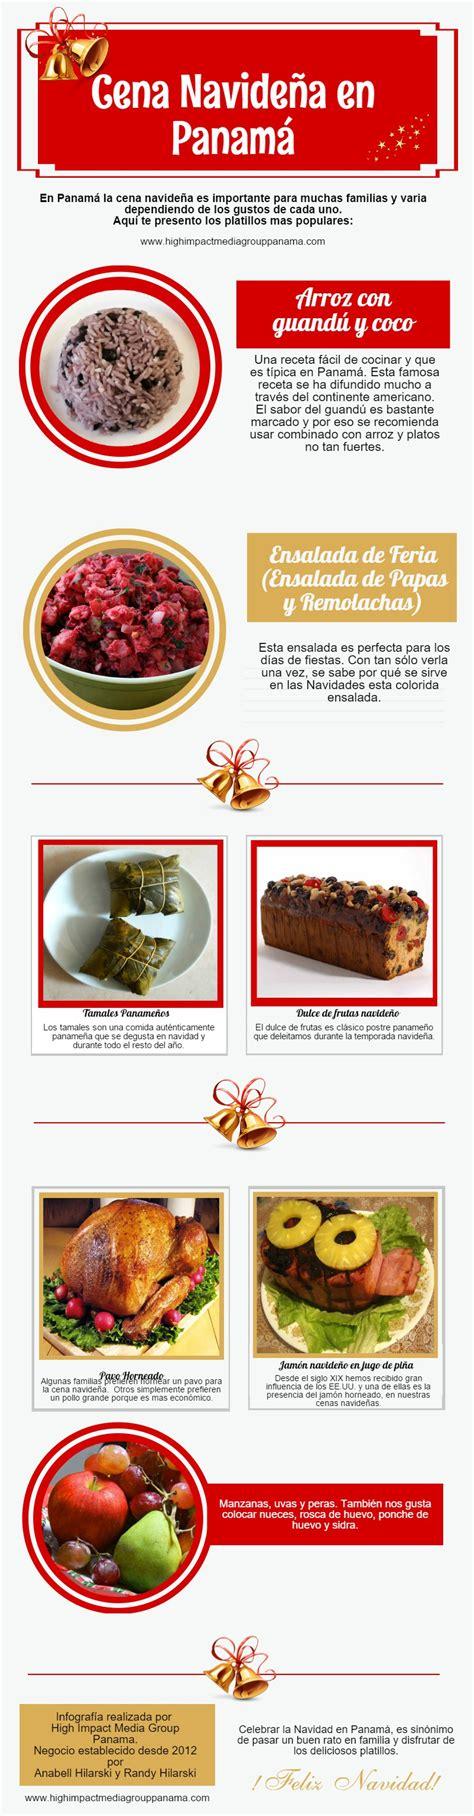 panamanian foods on christmas cena navide 241 a en panam 225 in america spain panamanian food panama recipe